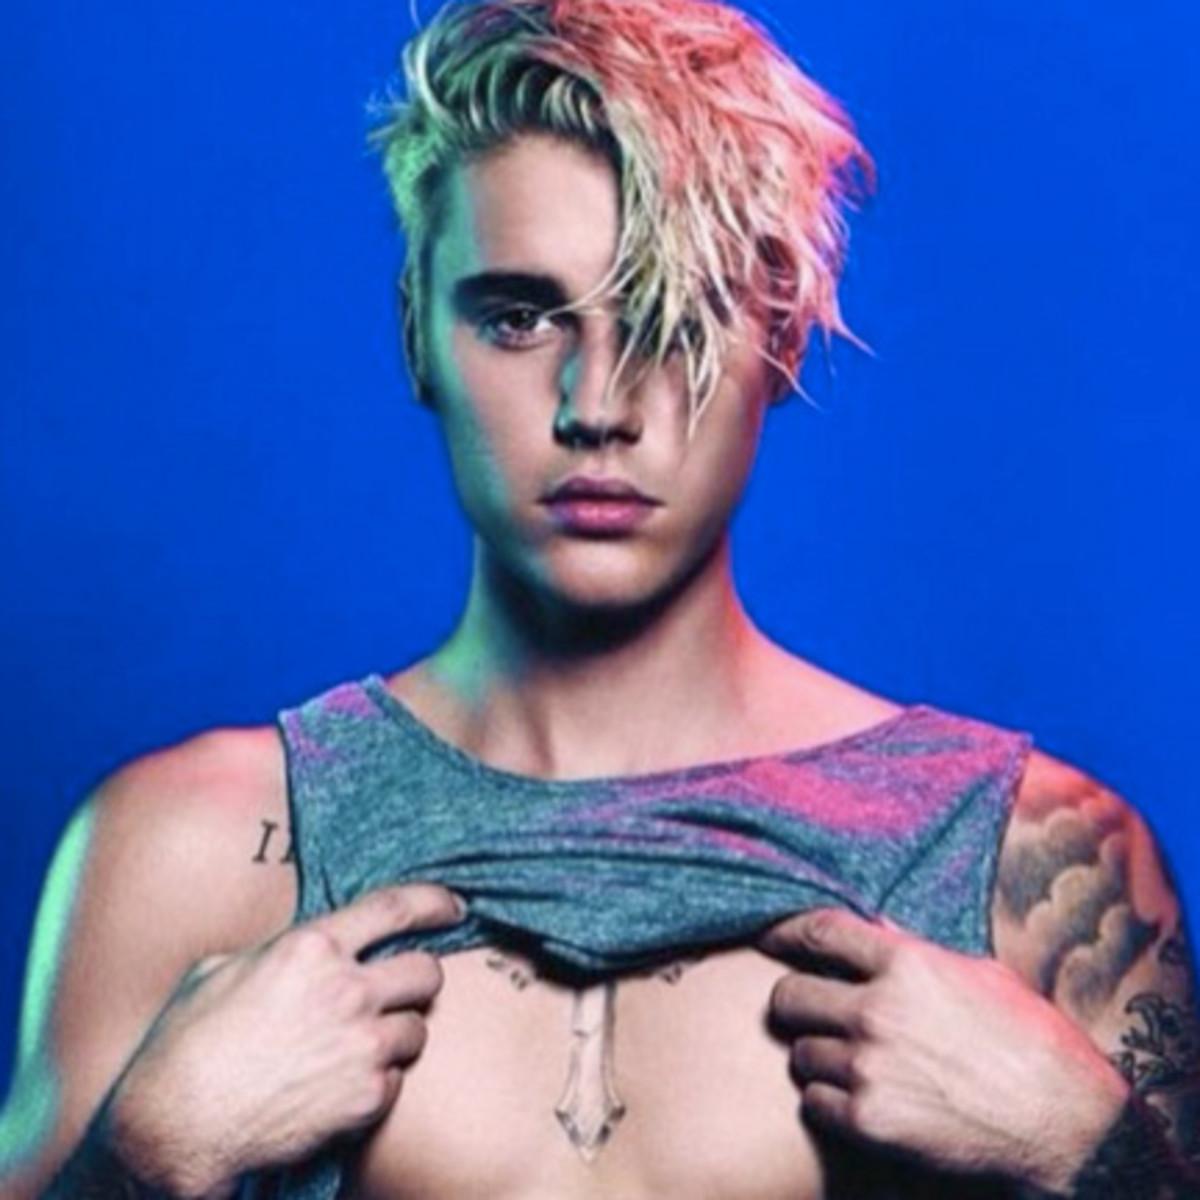 Houston, Justin Bieber, November 2015, Purpose album